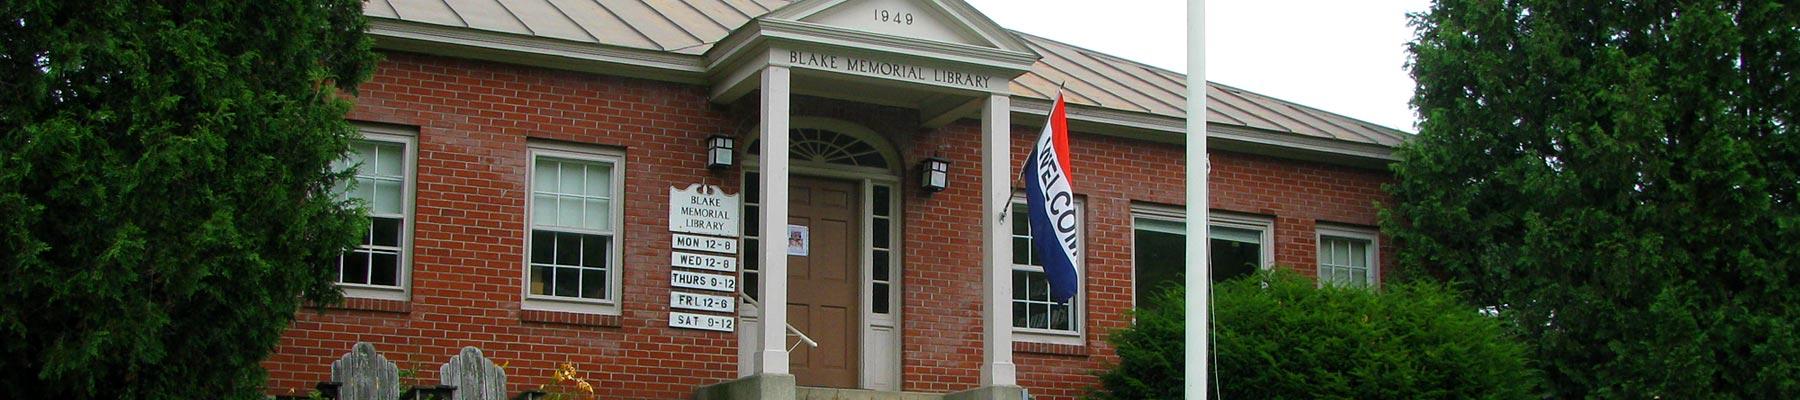 Services - Blake Memorial Library - Corinth Vermont